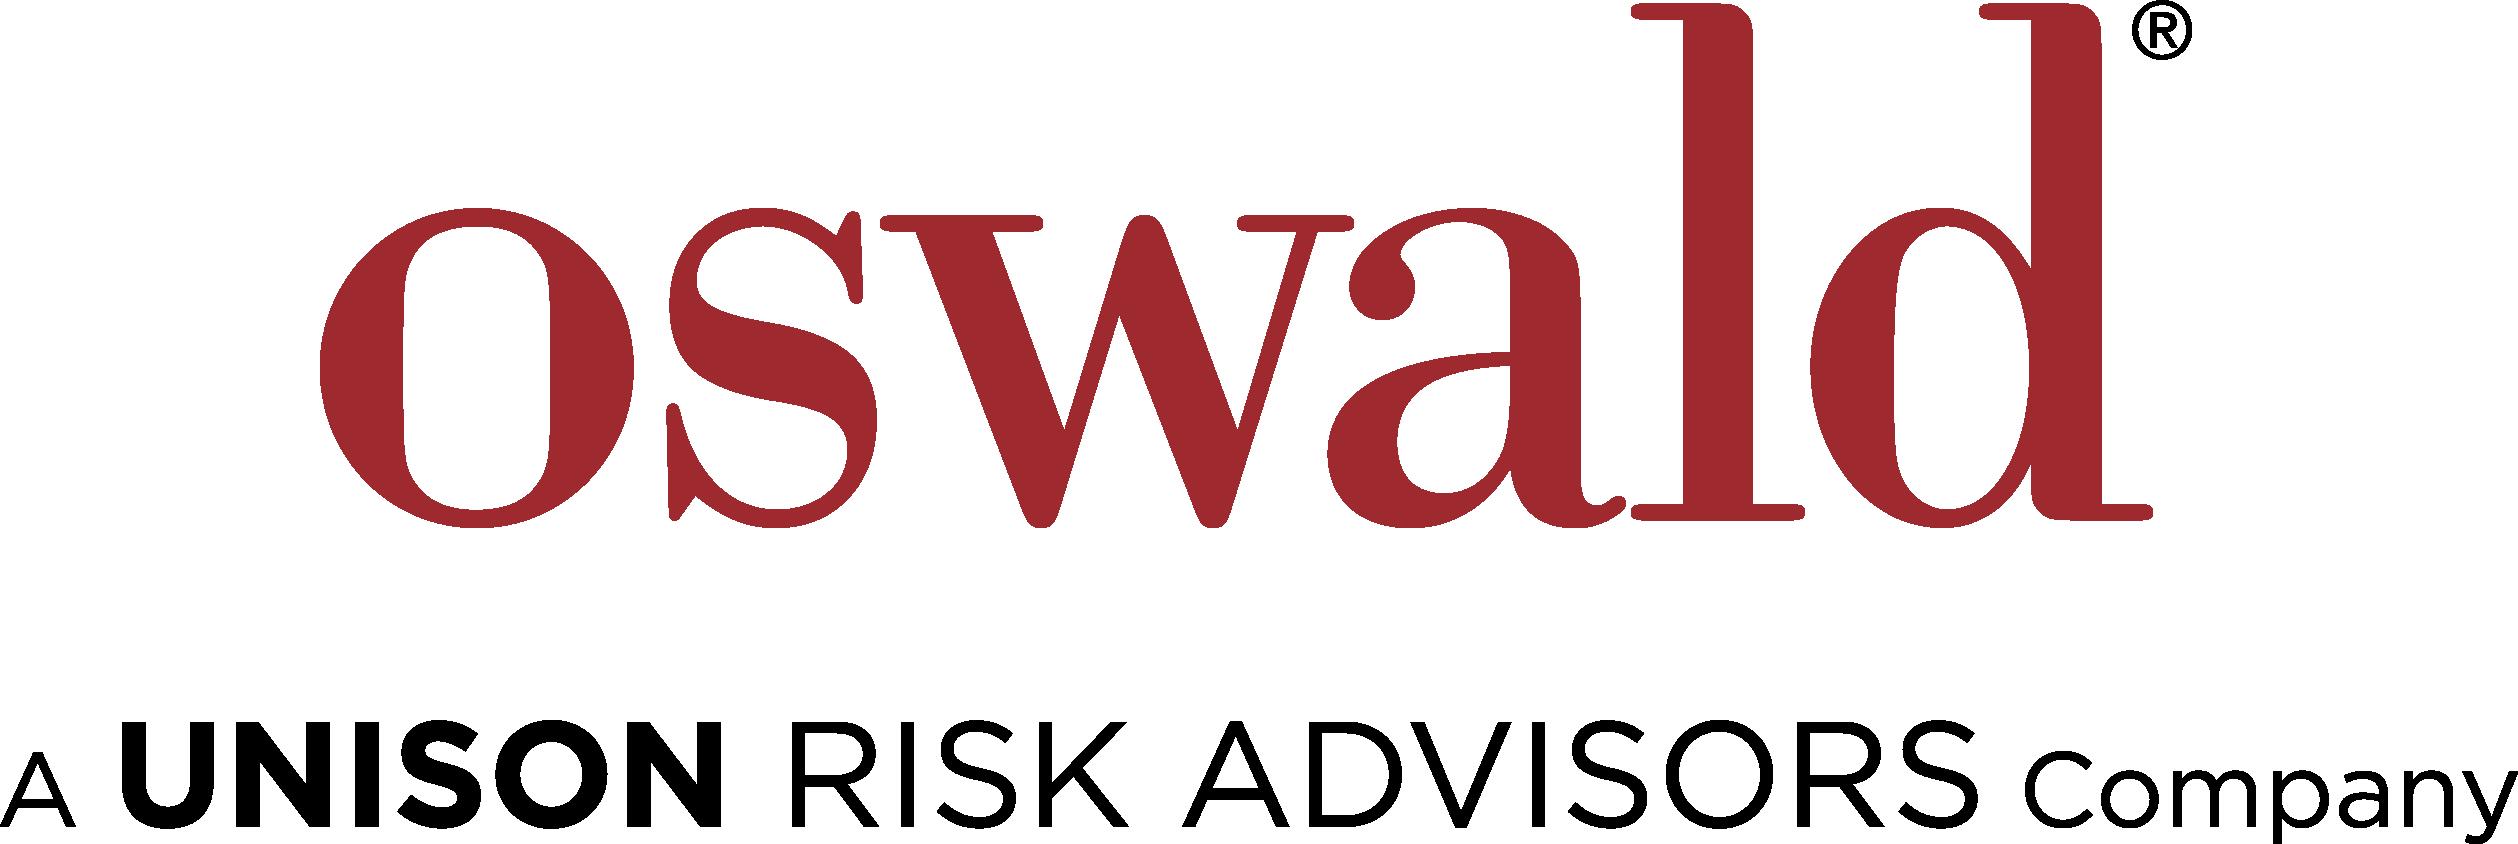 Oswald a unison risk advisors company